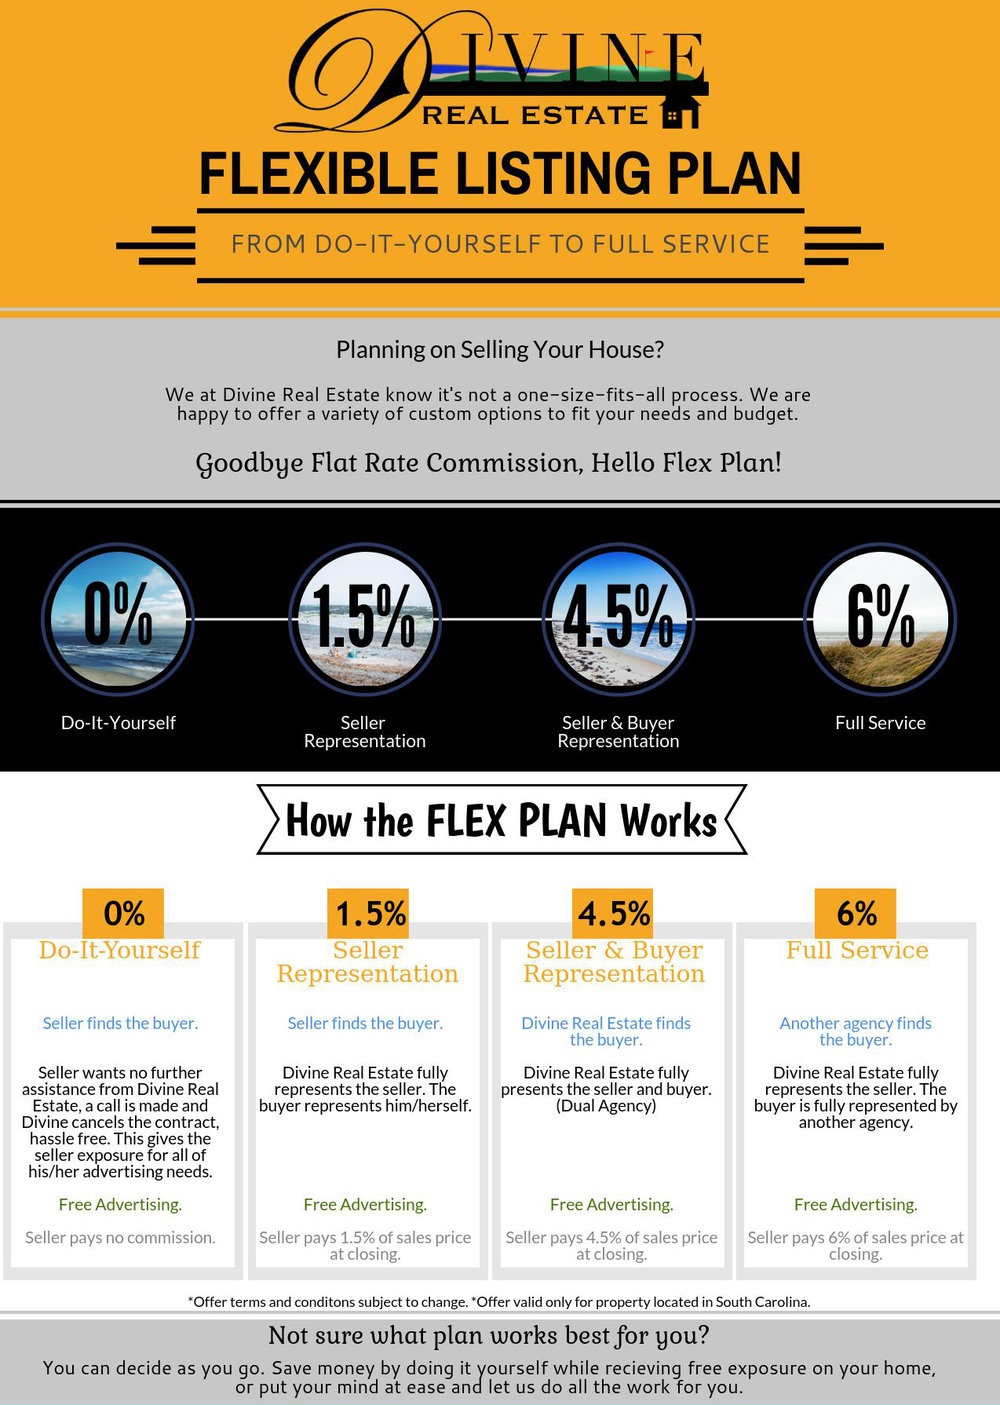 flexplan_91817_website.jpg